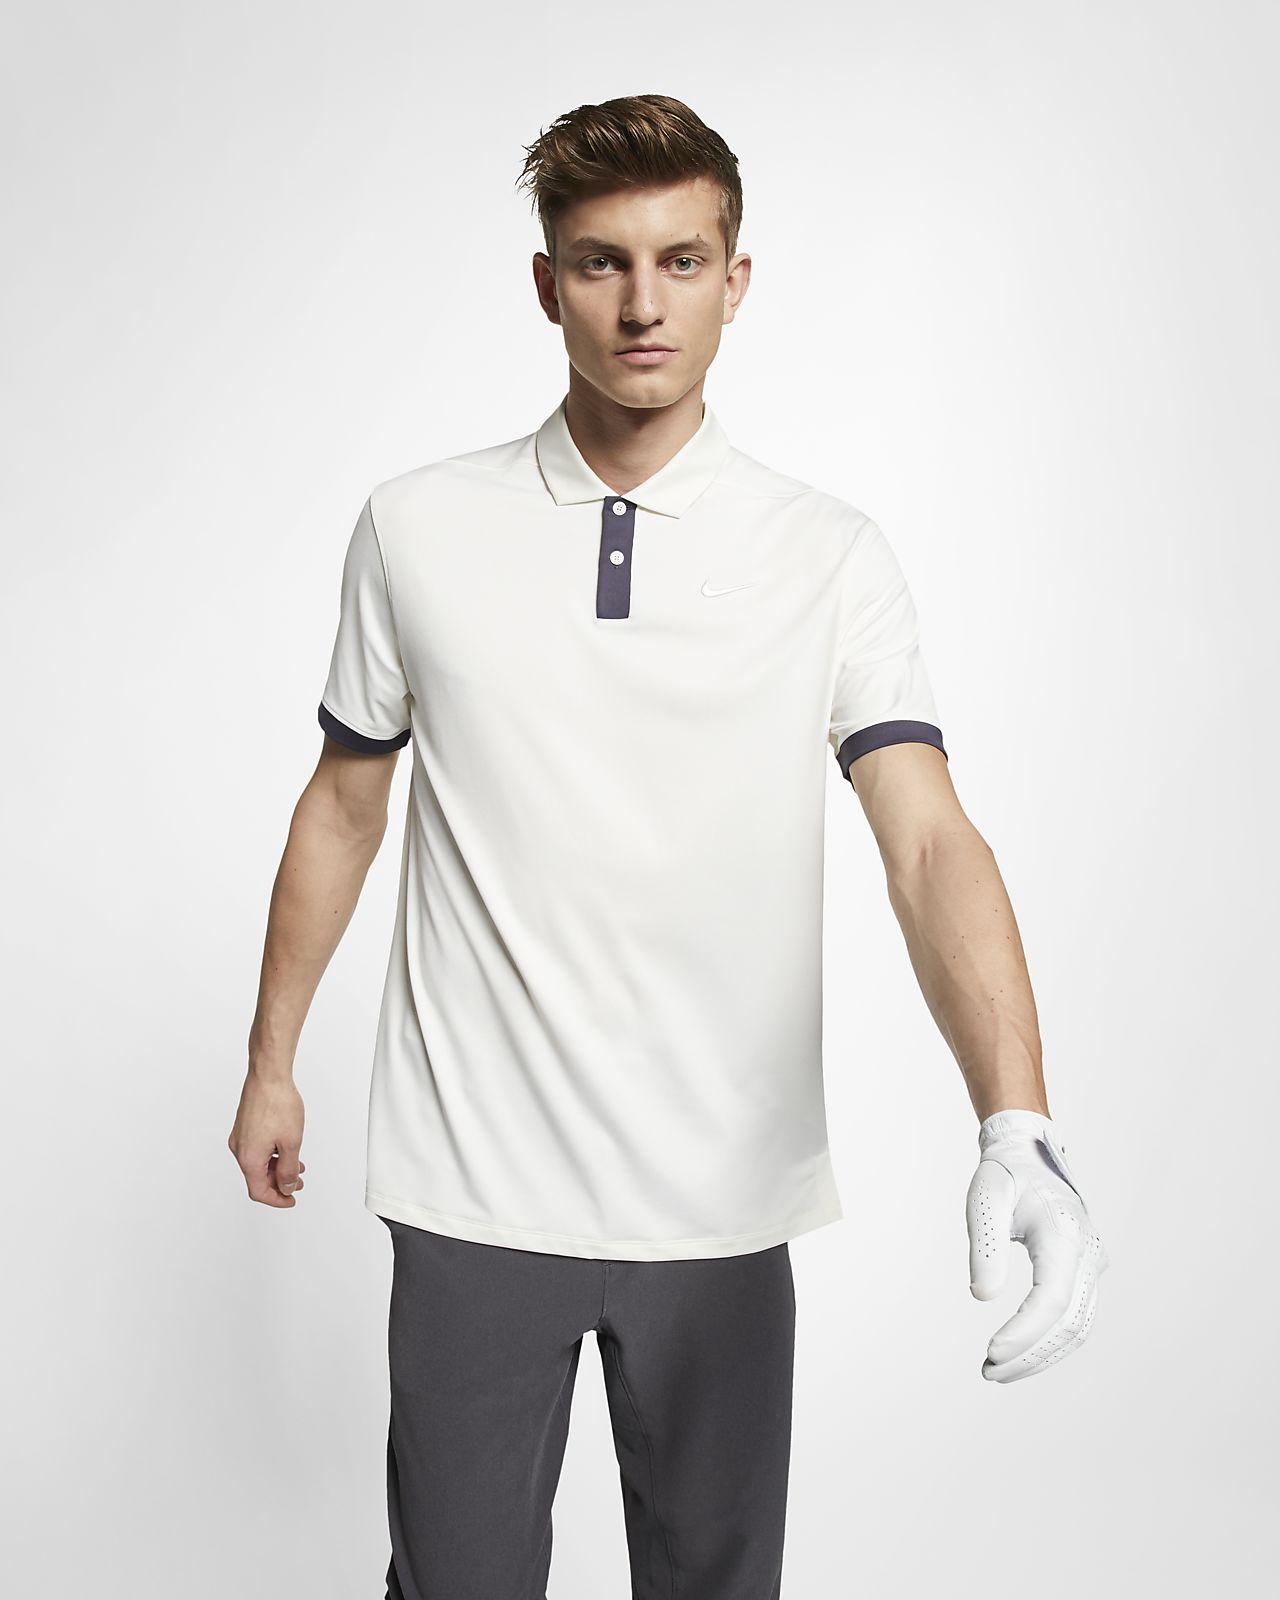 Nike Dri-FIT Vapor Herren-Golf-Poloshirt